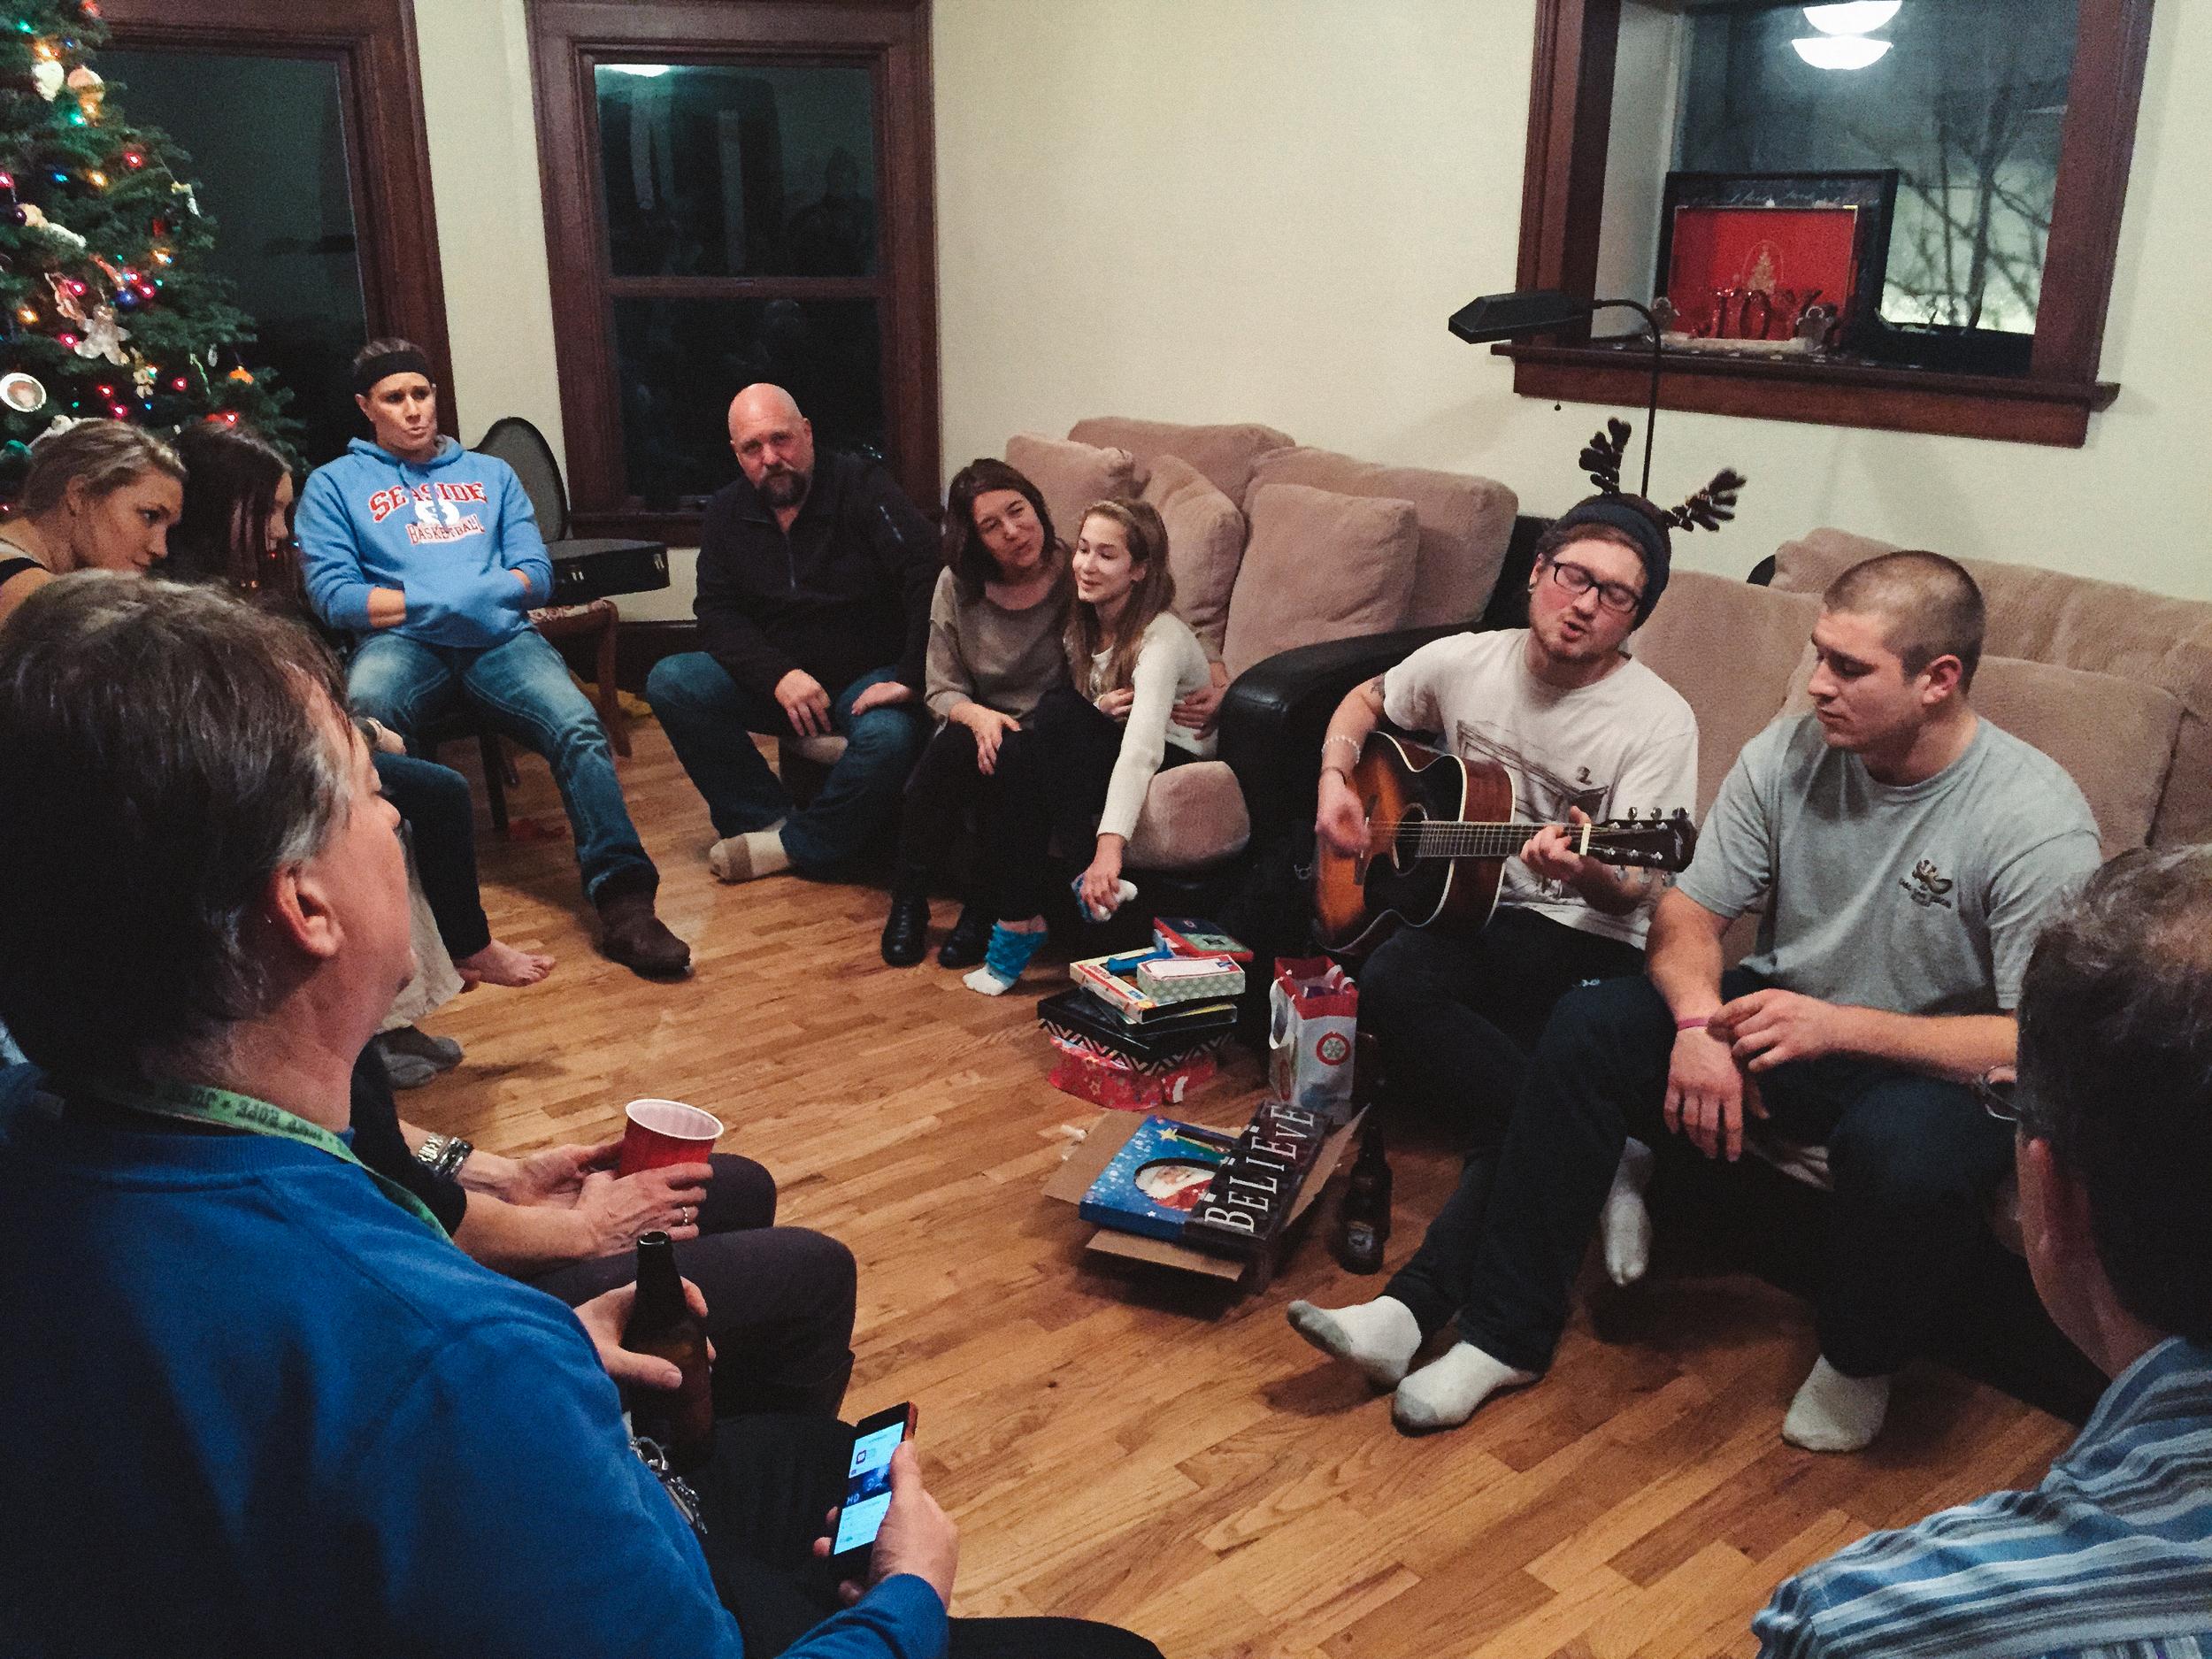 Dundas family Christmas Eve. K.C. entertains all.